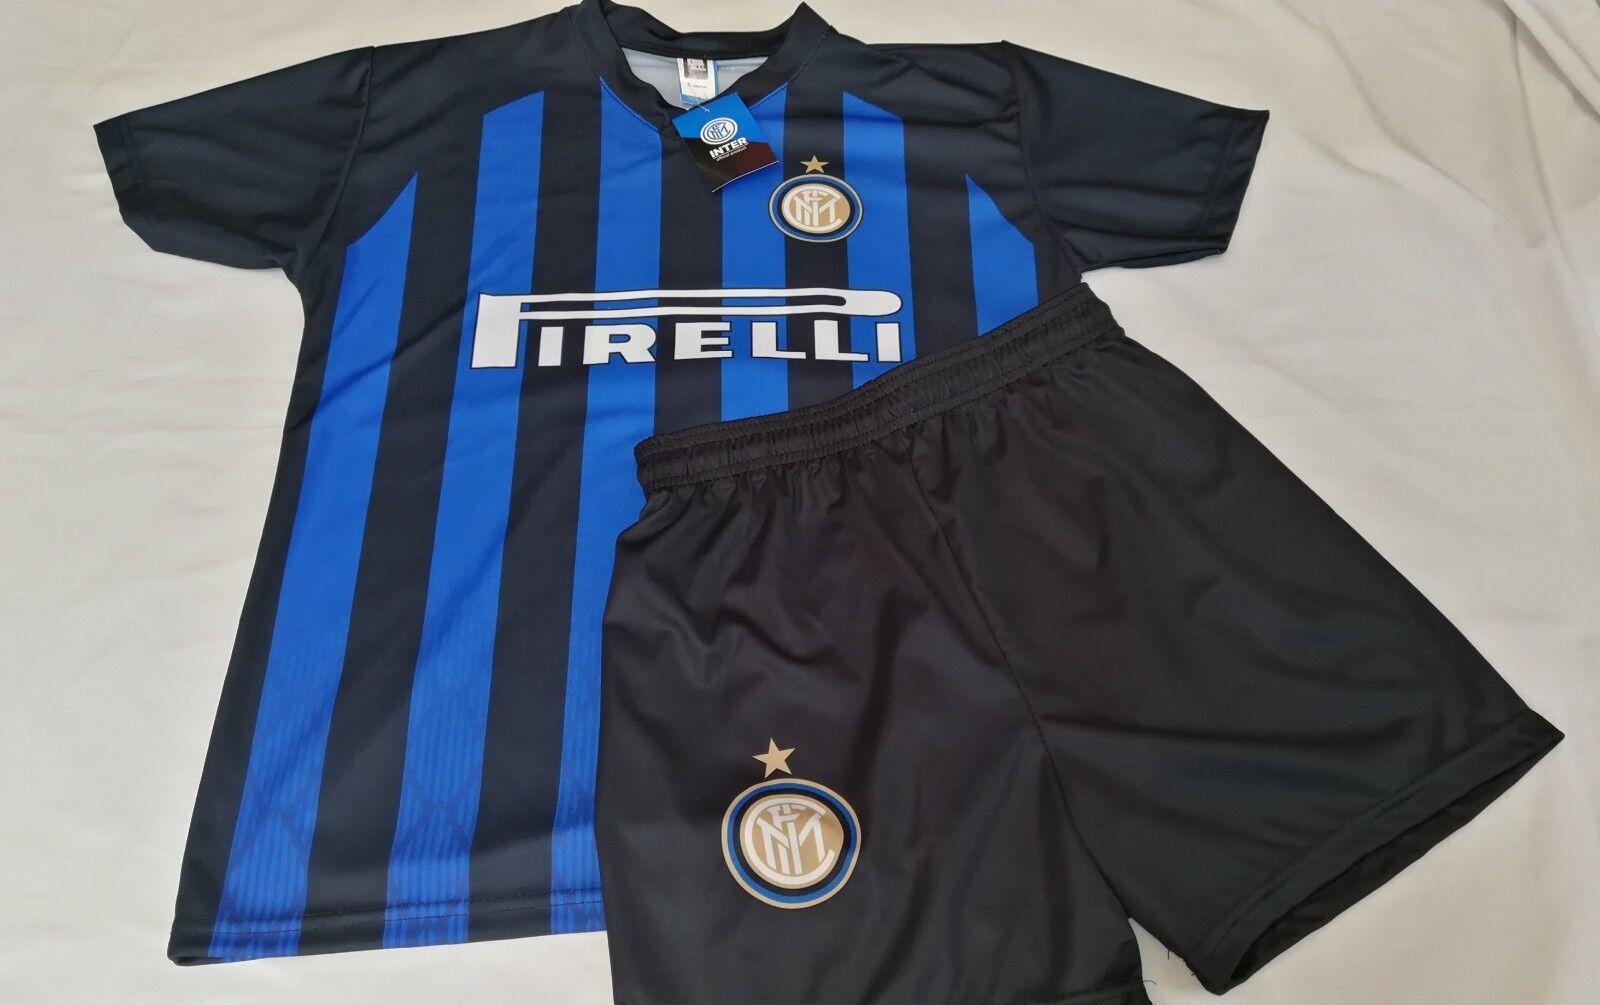 Full 2019 Taille 2 years Mauro Ivoituredi FC Inter 2018 19 Jersey Shirt Home